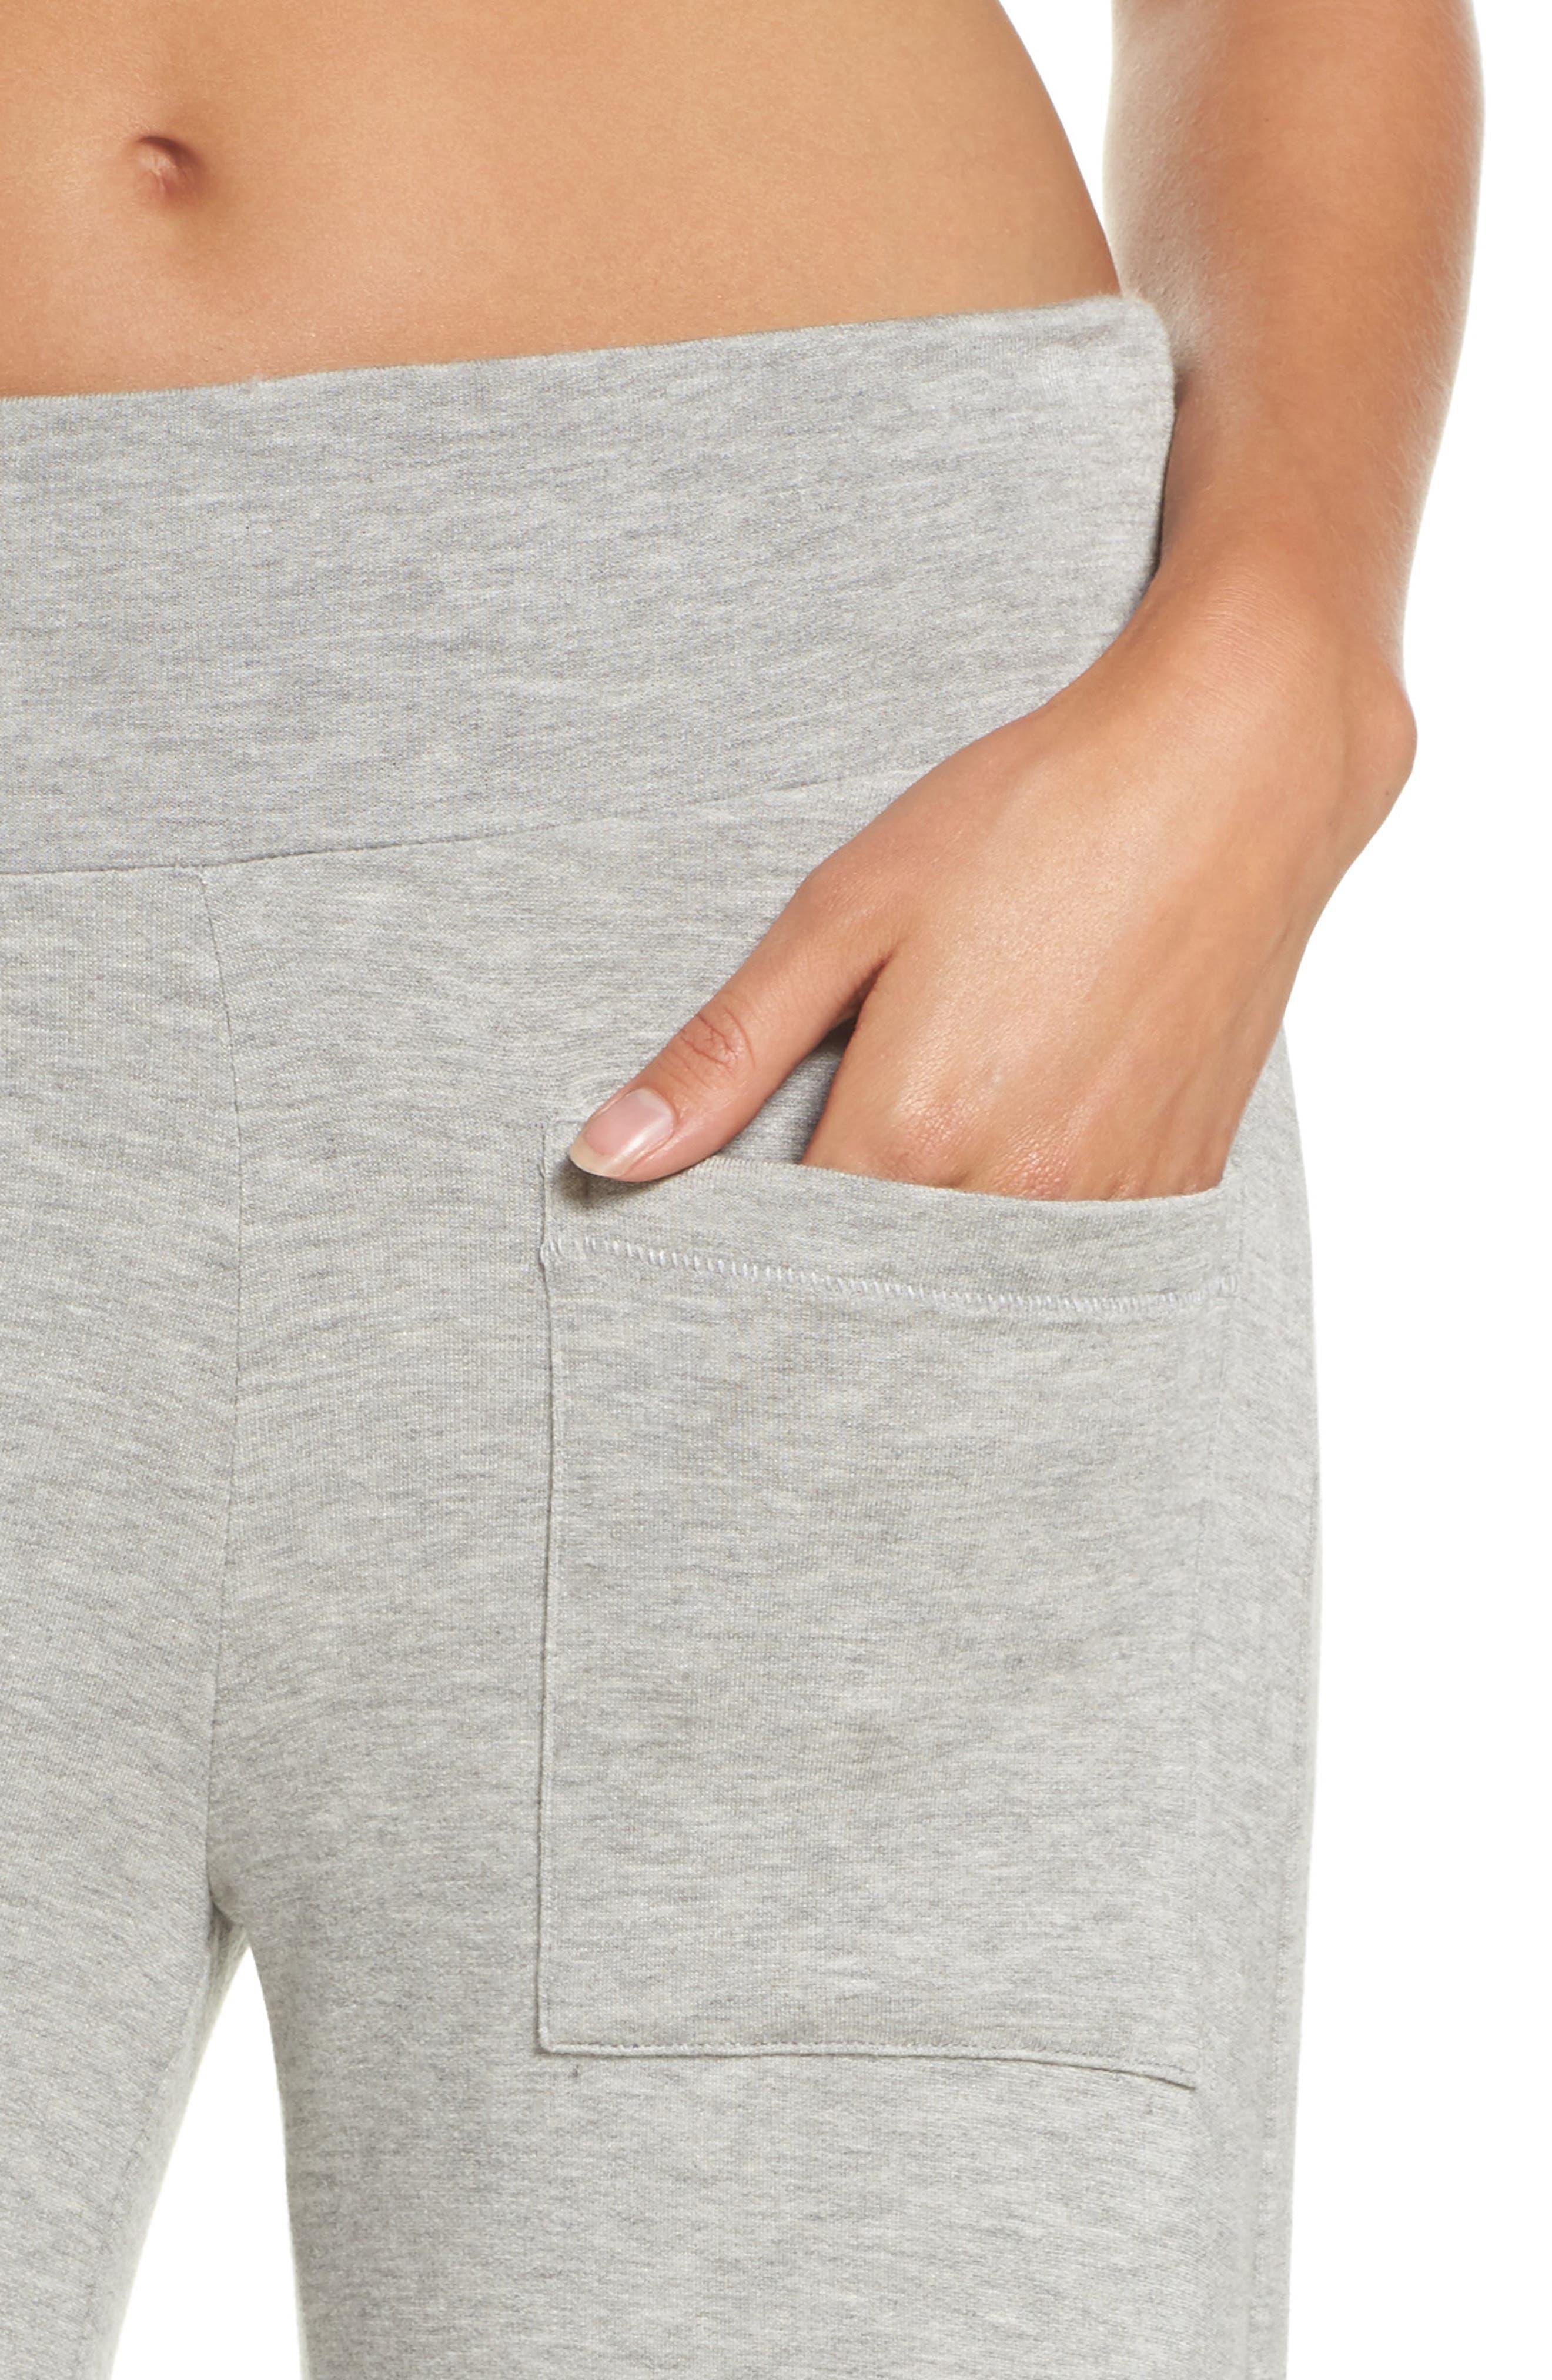 Runway Culotte Sweatpants,                             Alternate thumbnail 4, color,                             Light Heather Grey